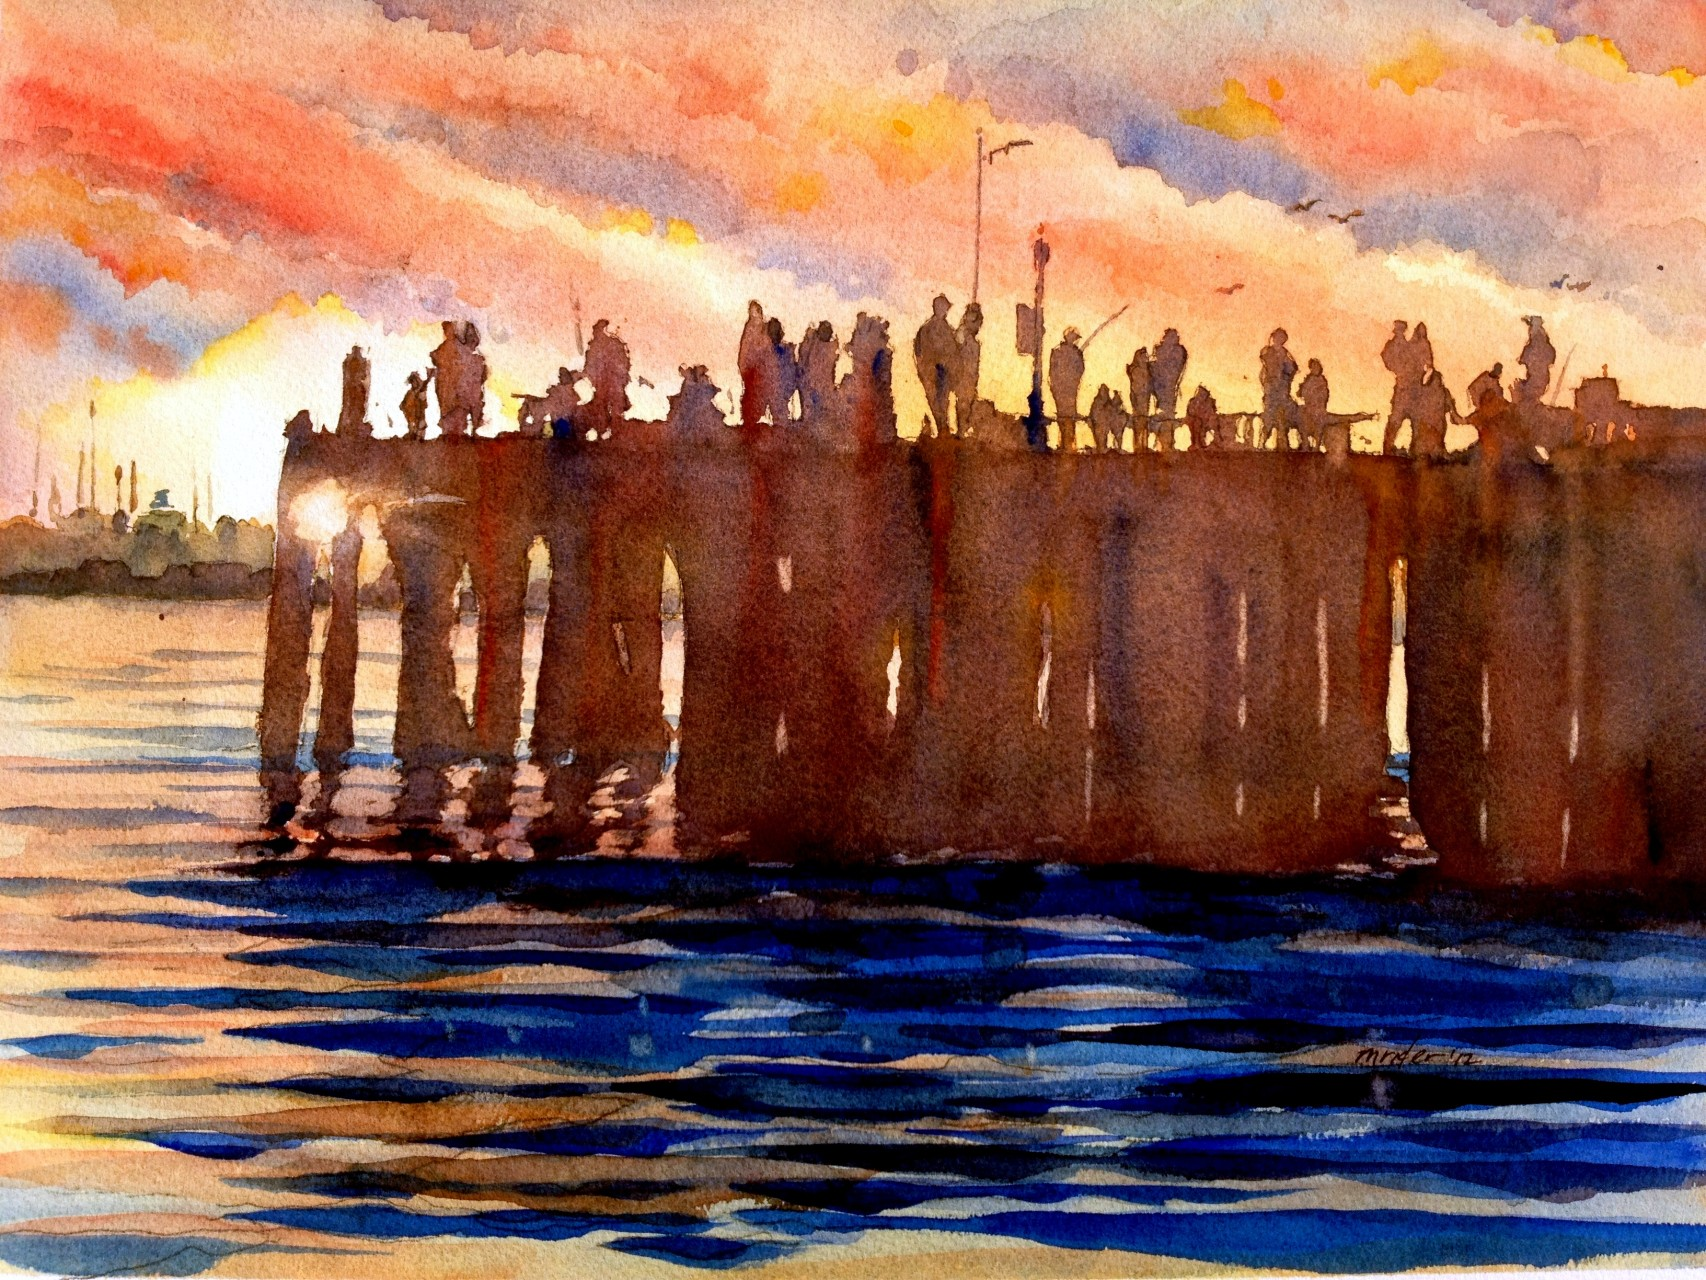 Sunset Over the Santa Barbara Wharf 2